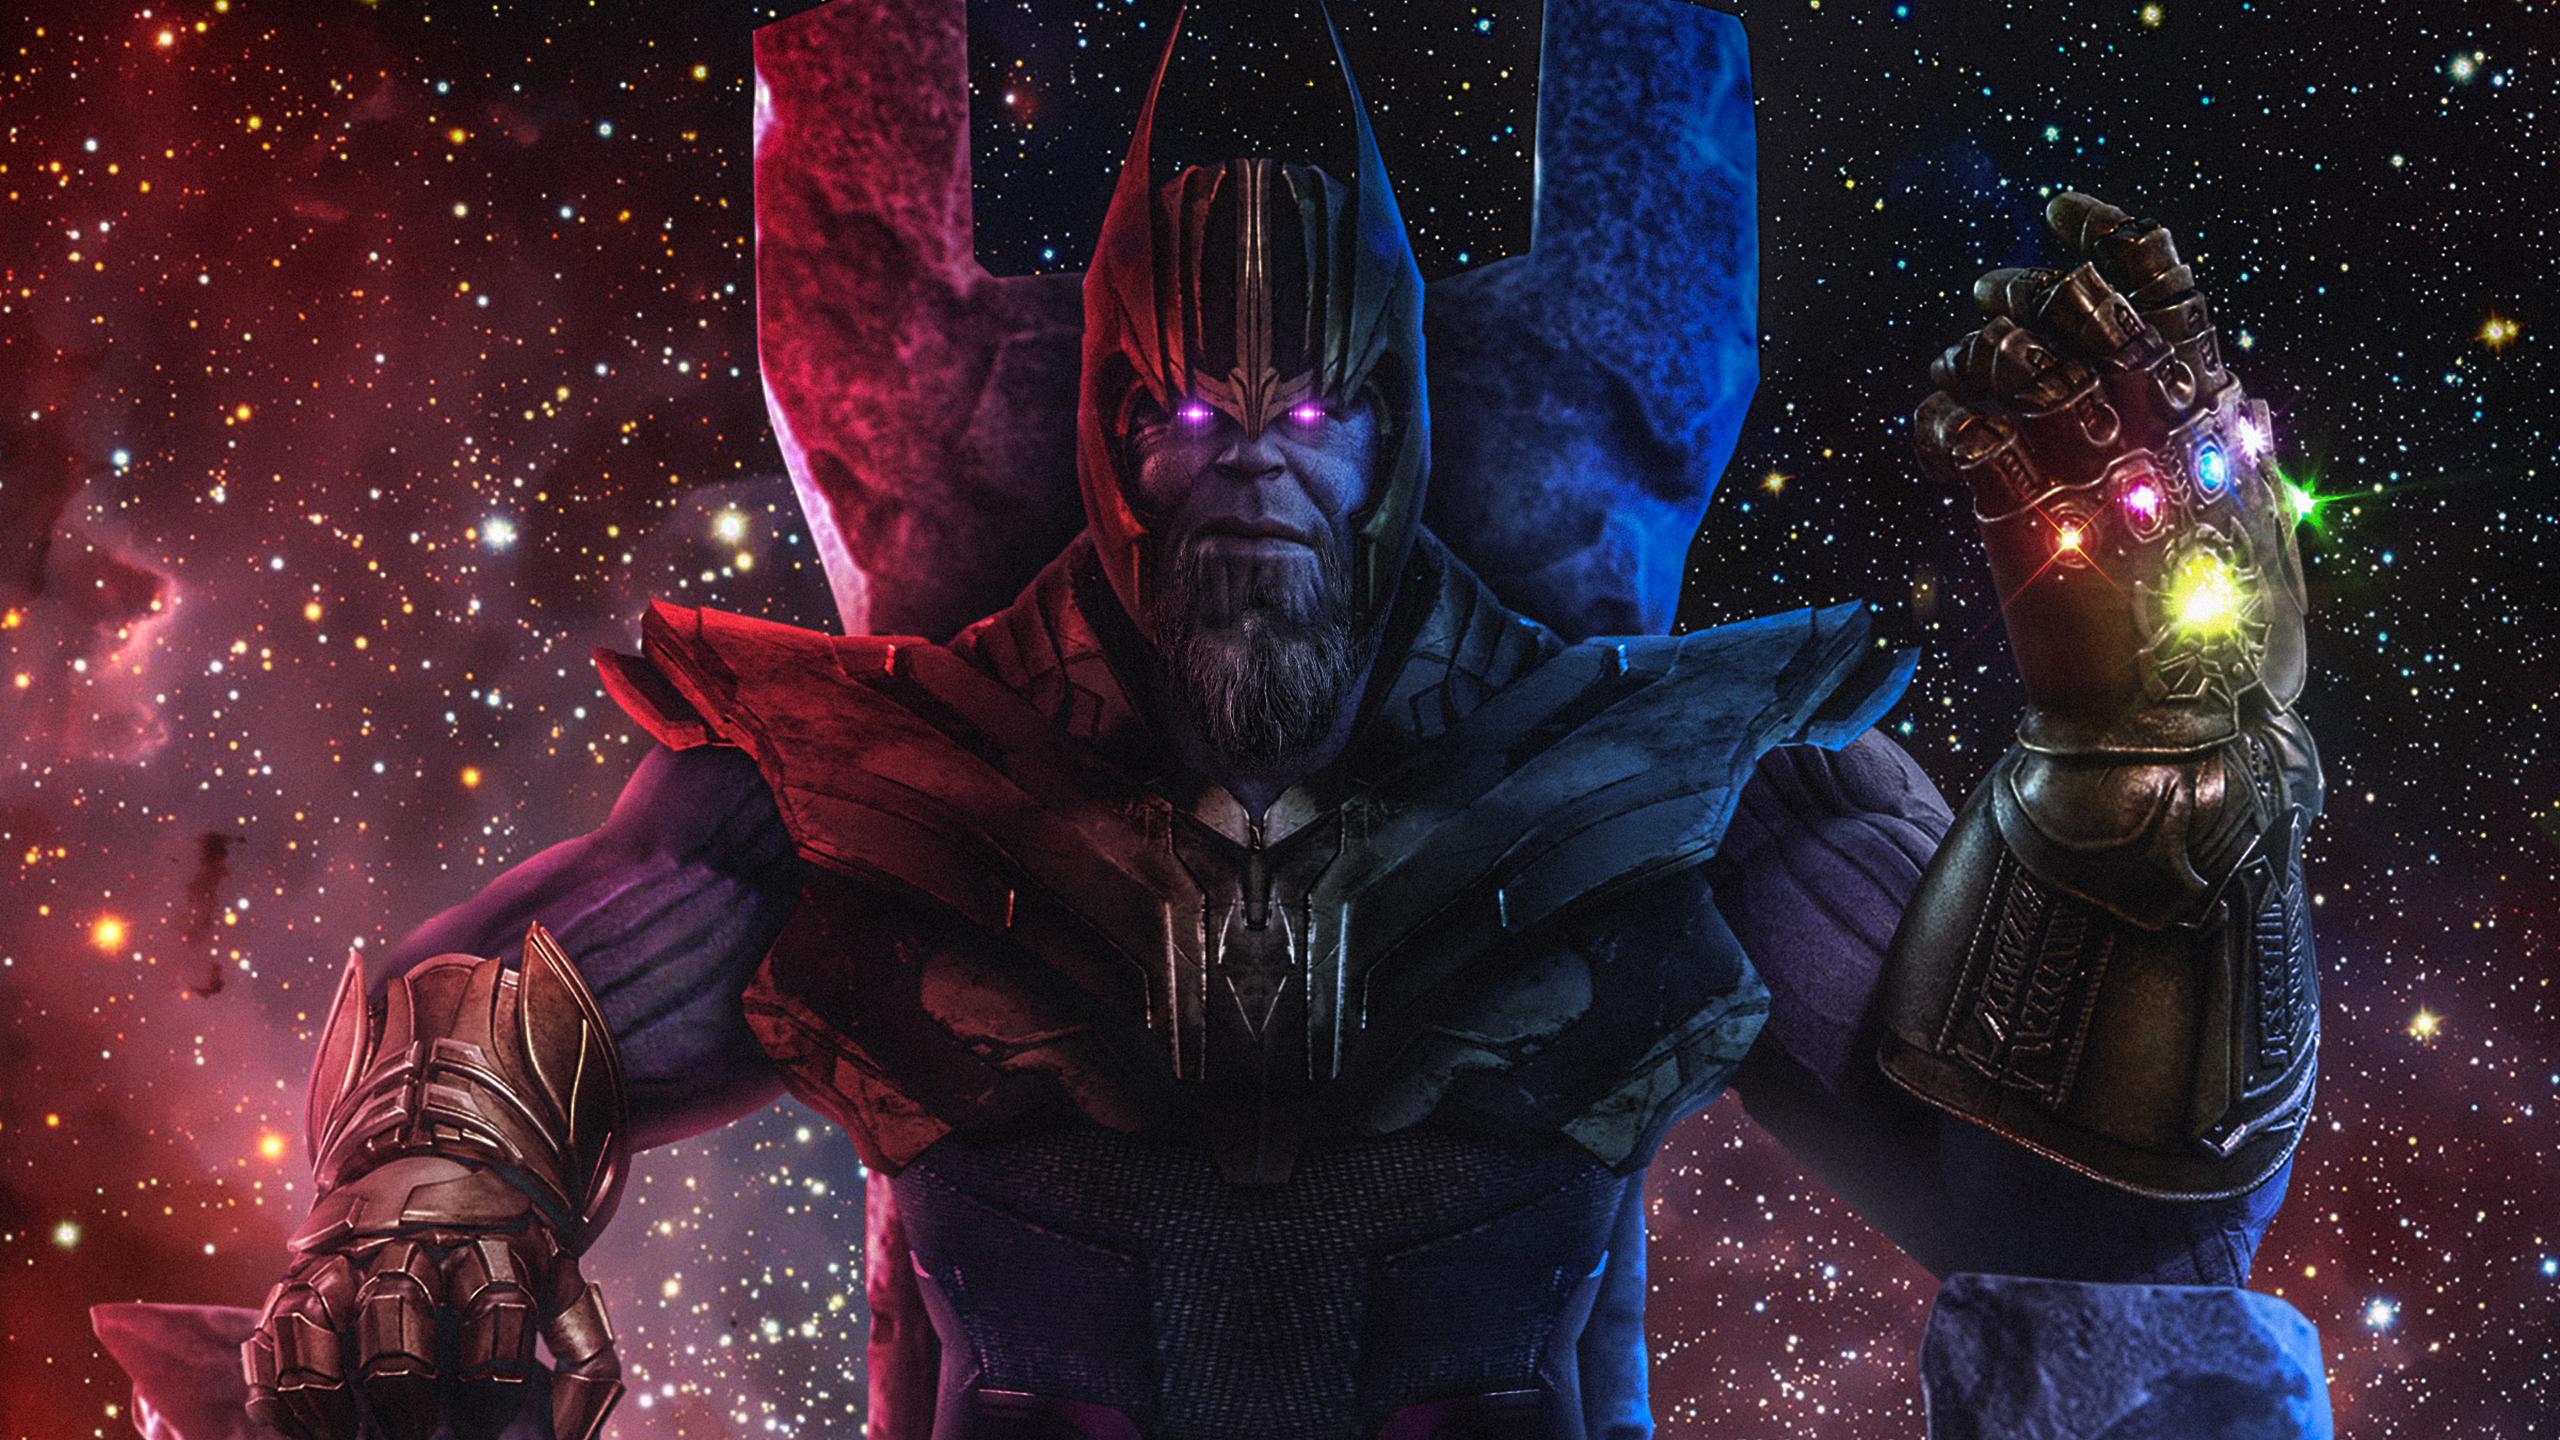 Танос фан-арт обои скачать